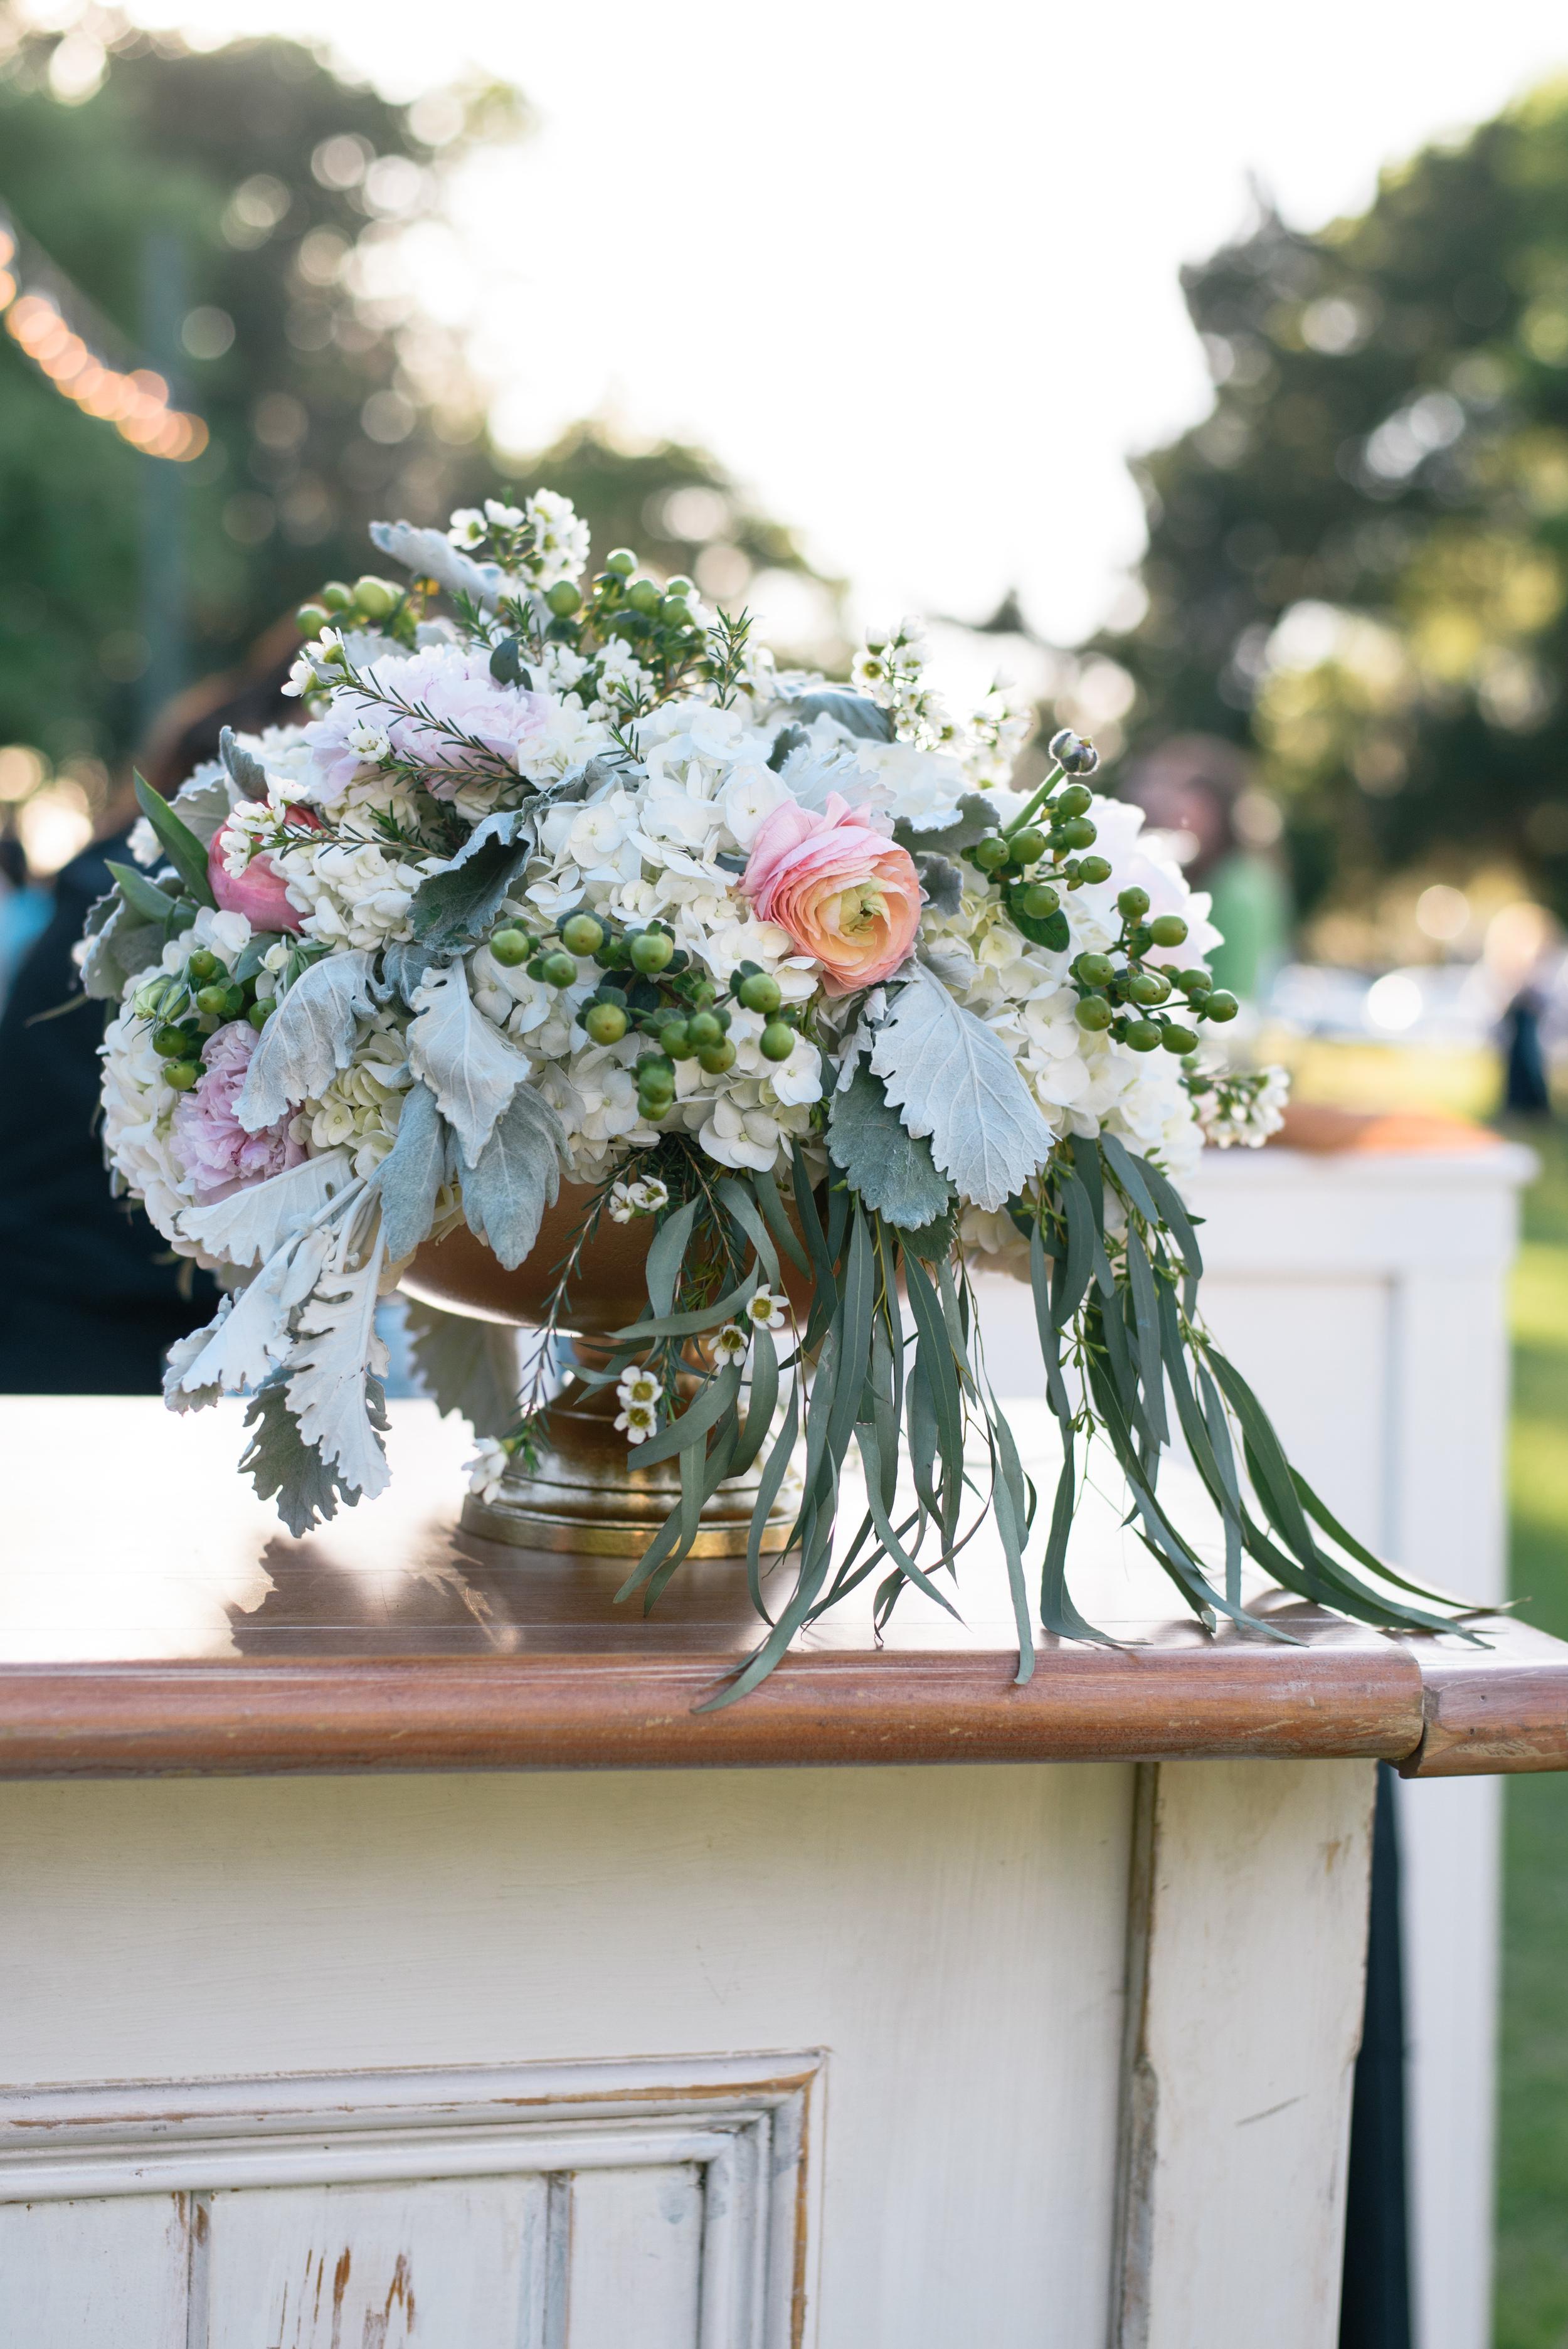 kadi-and-matt-carroll-april-9-2016-jekyl-island-wedding-m-newsom-photography- (300 of 484).jpg